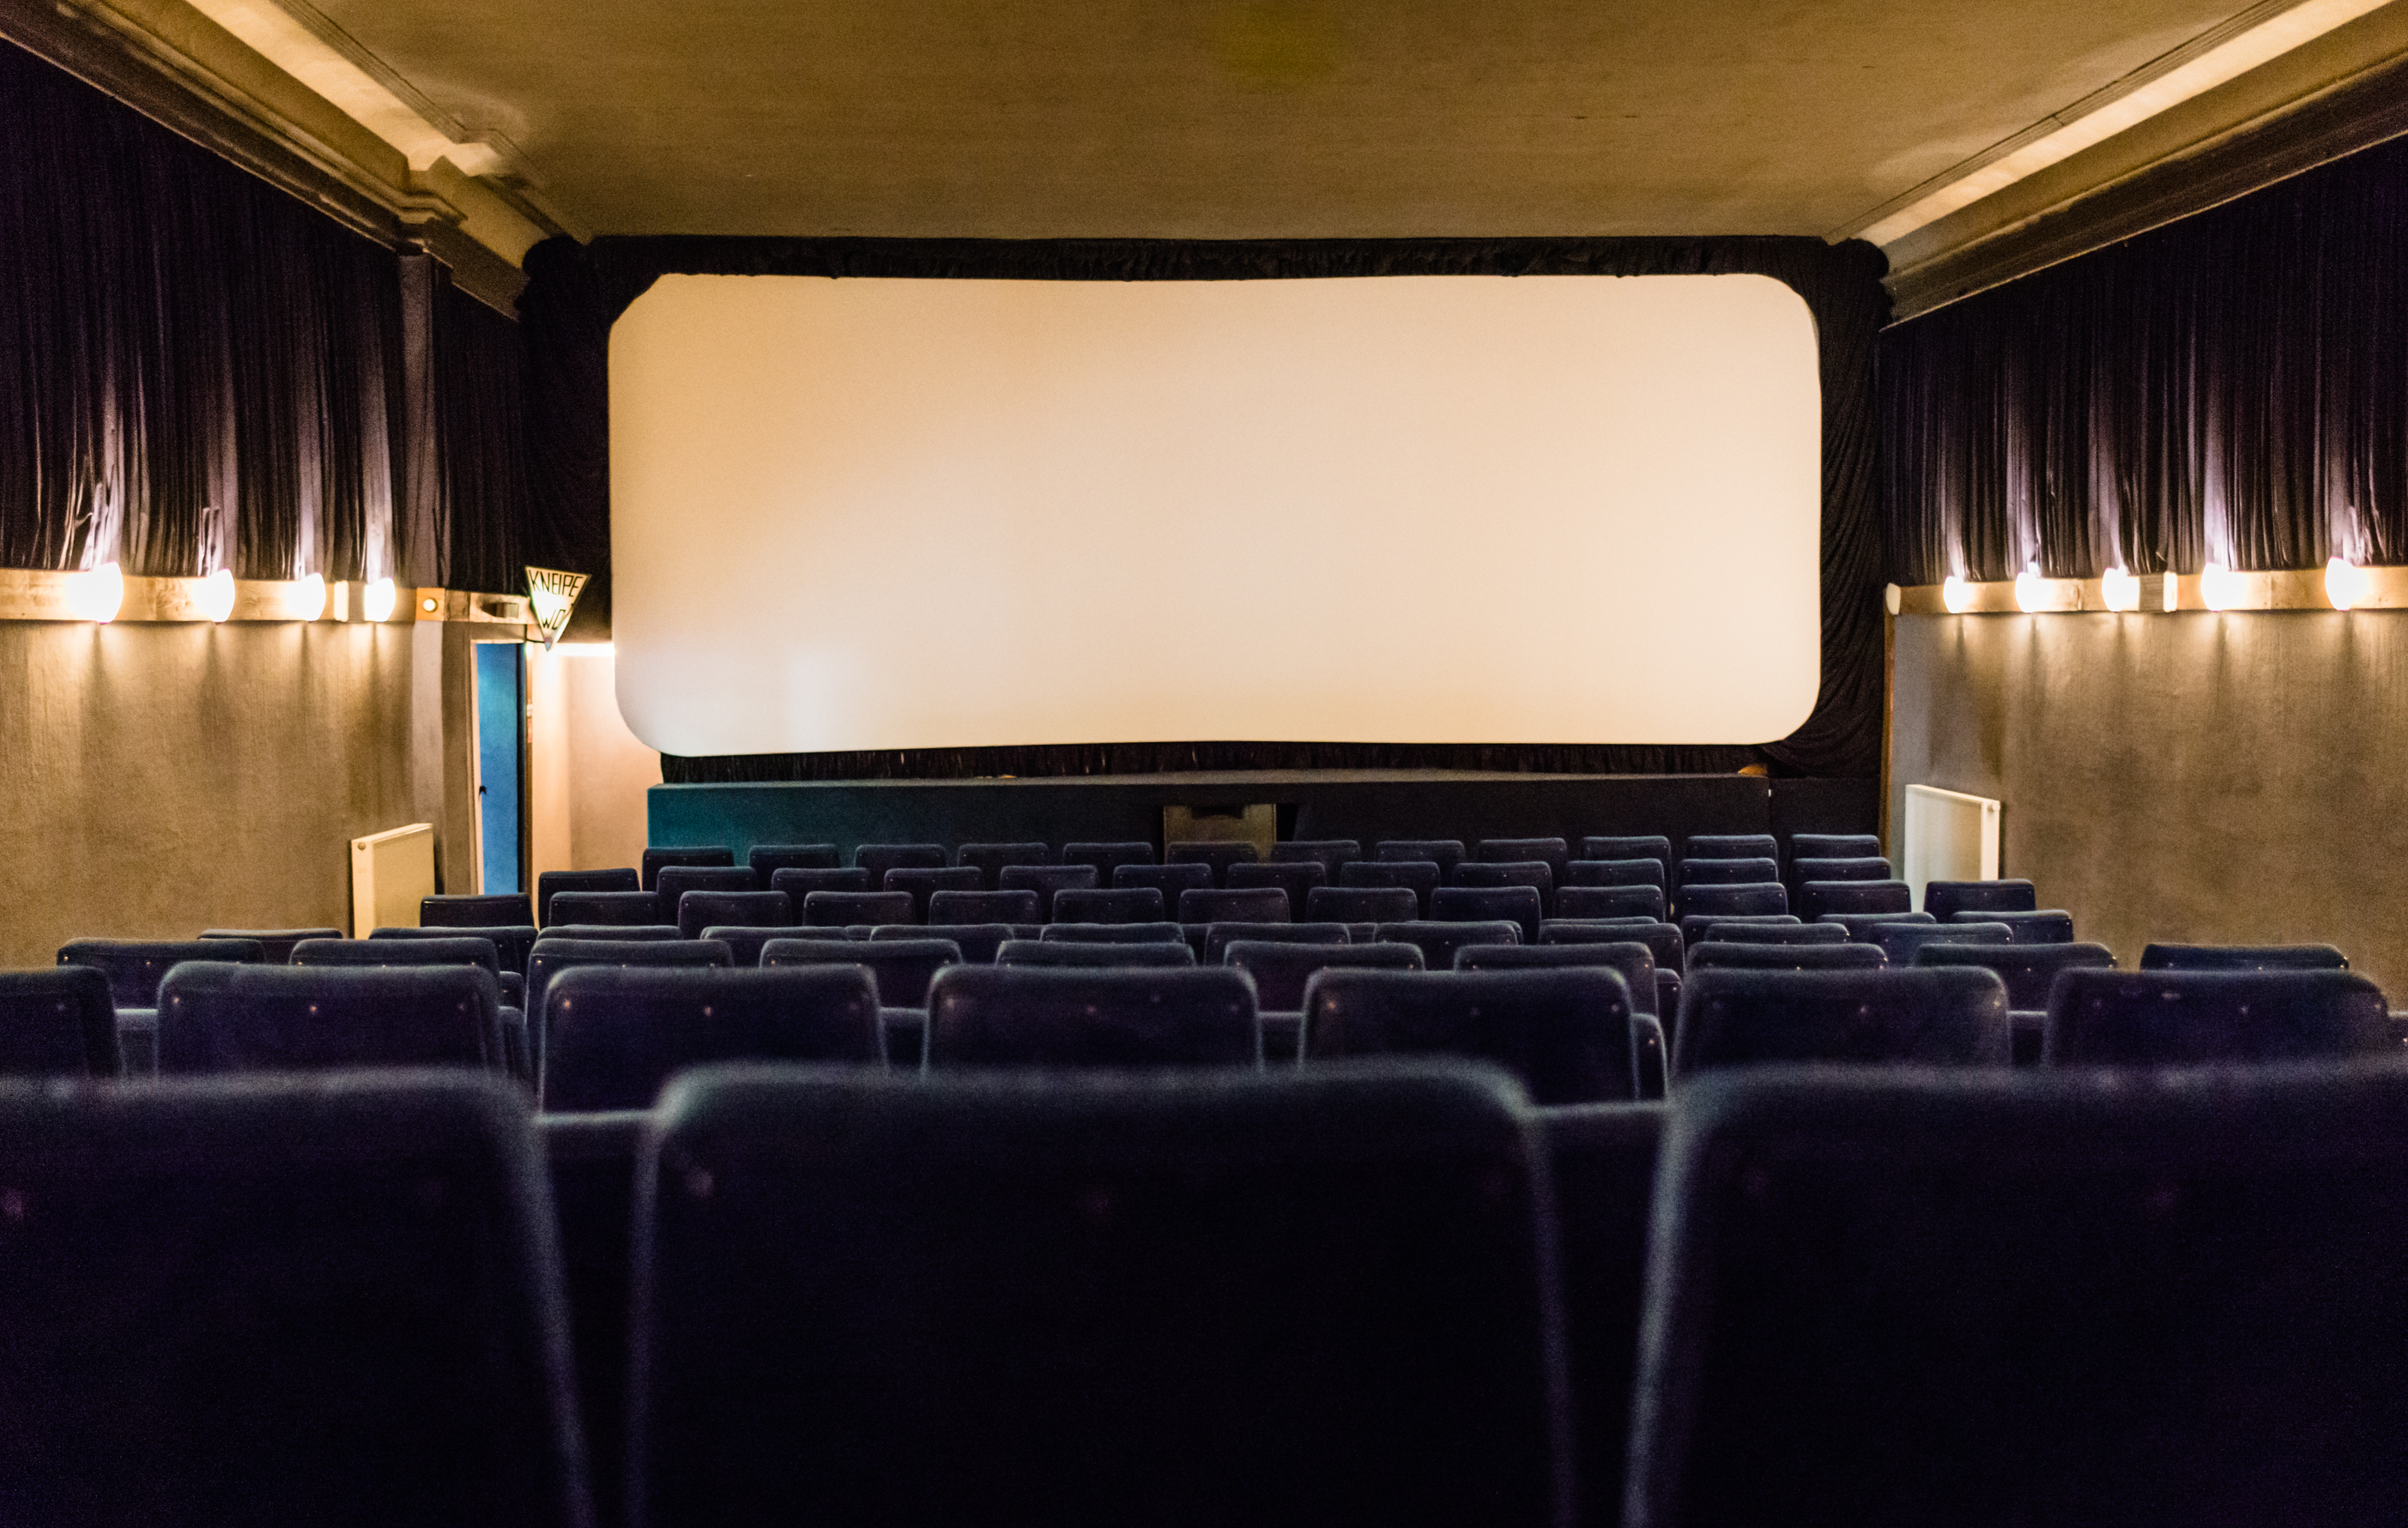 Ganz großes Kino